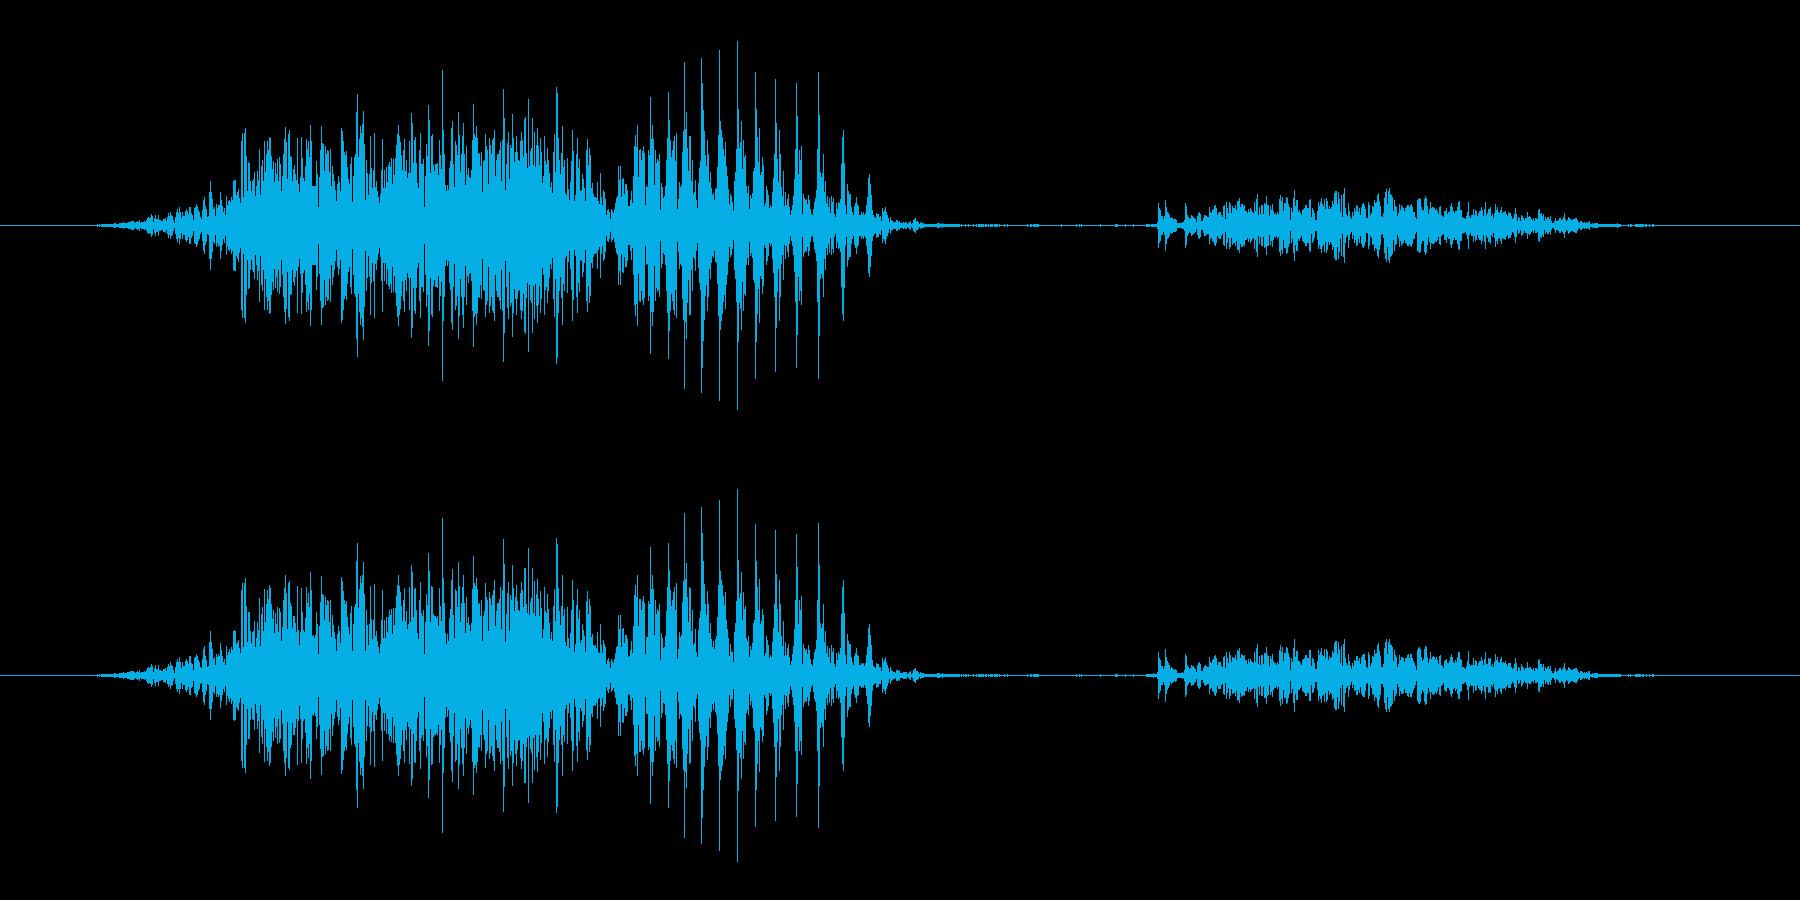 6 (six, 英語、男国女性声優J1)の再生済みの波形